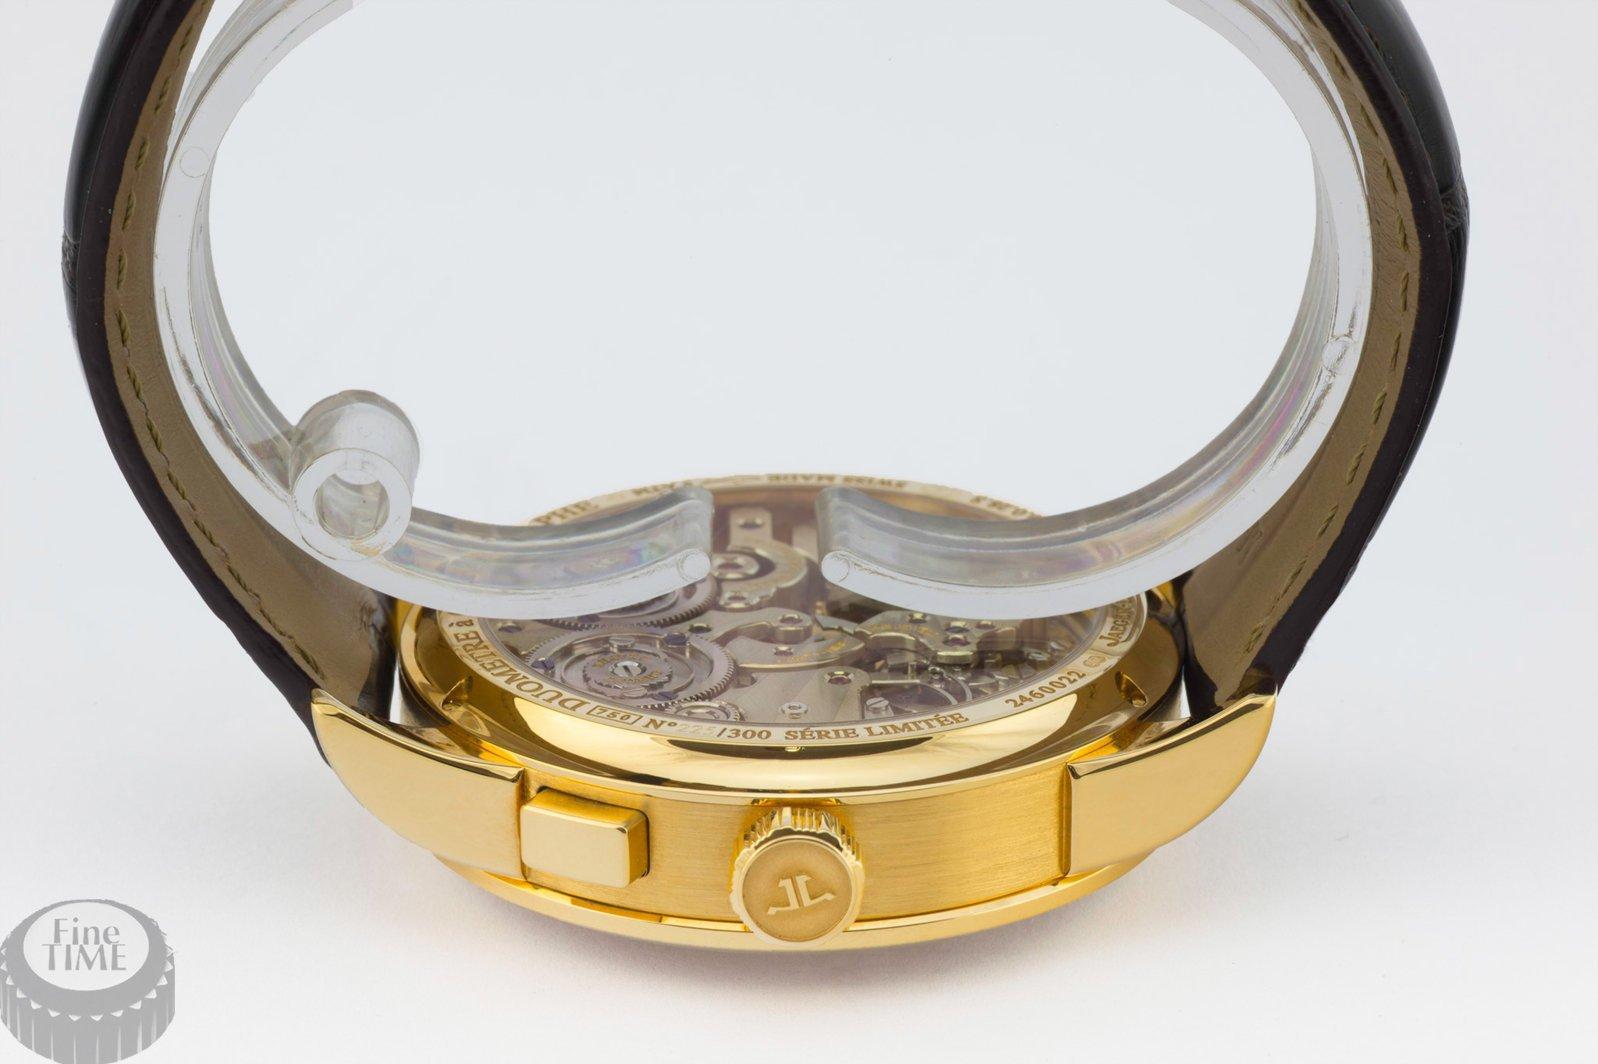 jaeger-lecoultre-duometre-chronographe-q6011420-05.jpg